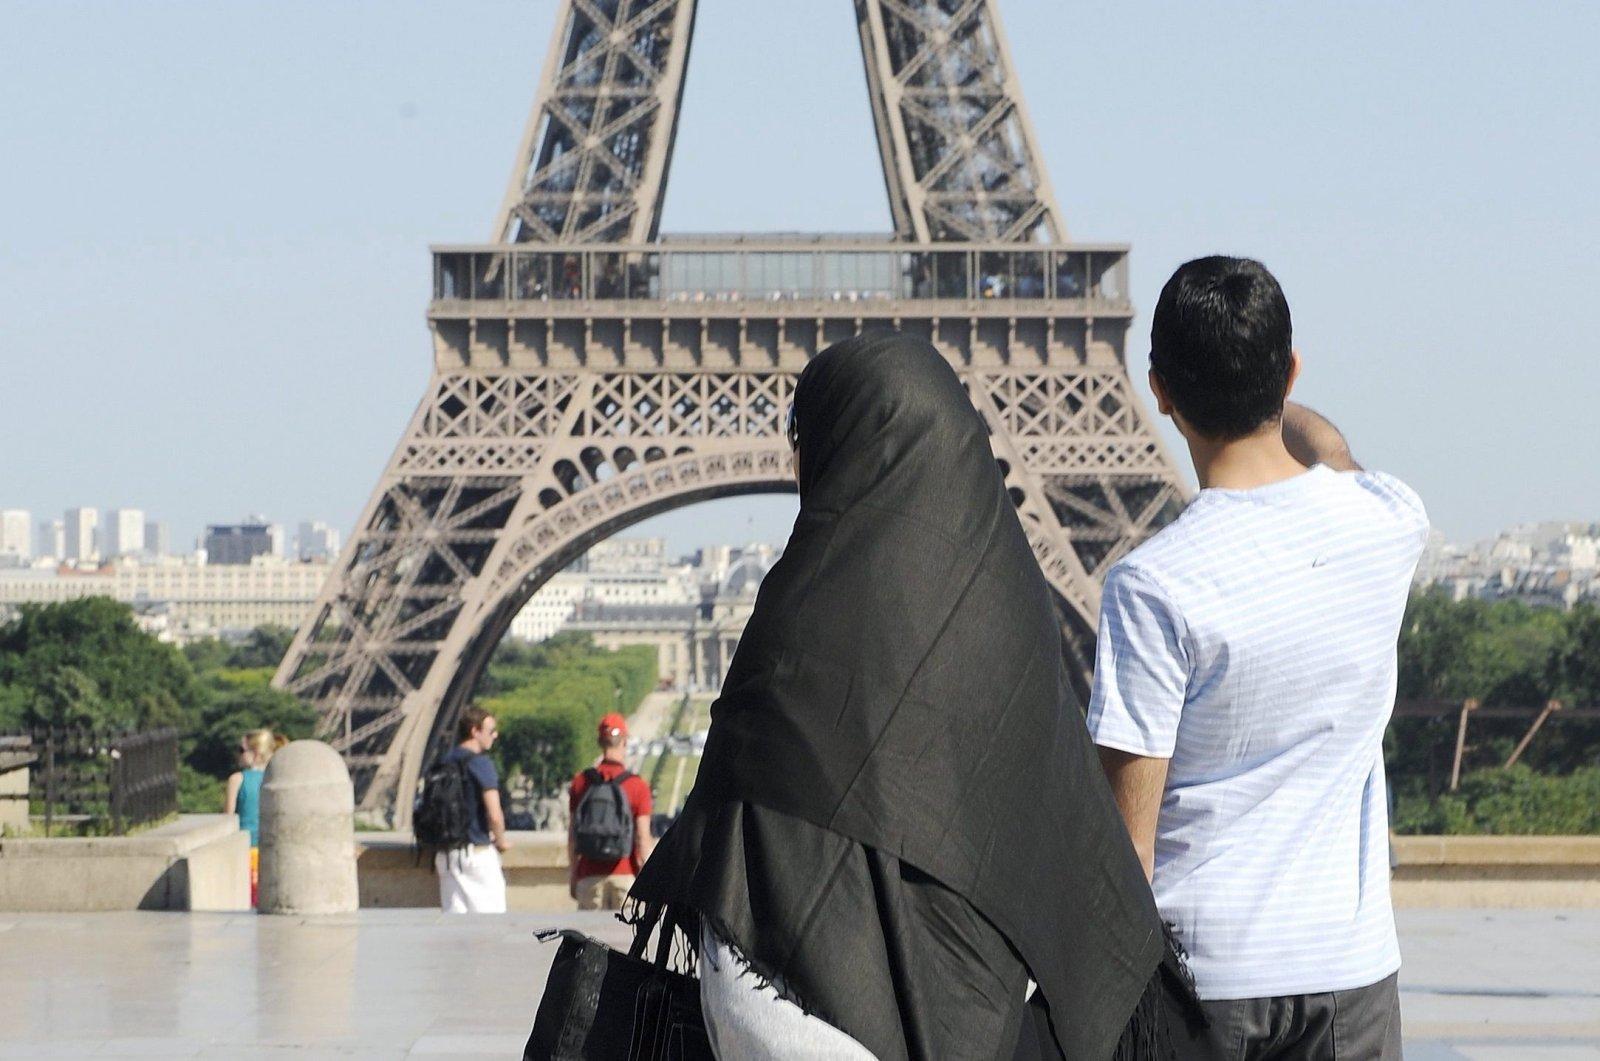 A woman wearing a niqab walks through Trocadero square near the Eiffel Tower in Paris, France, June 24, 2009. (Reuters File Photo)